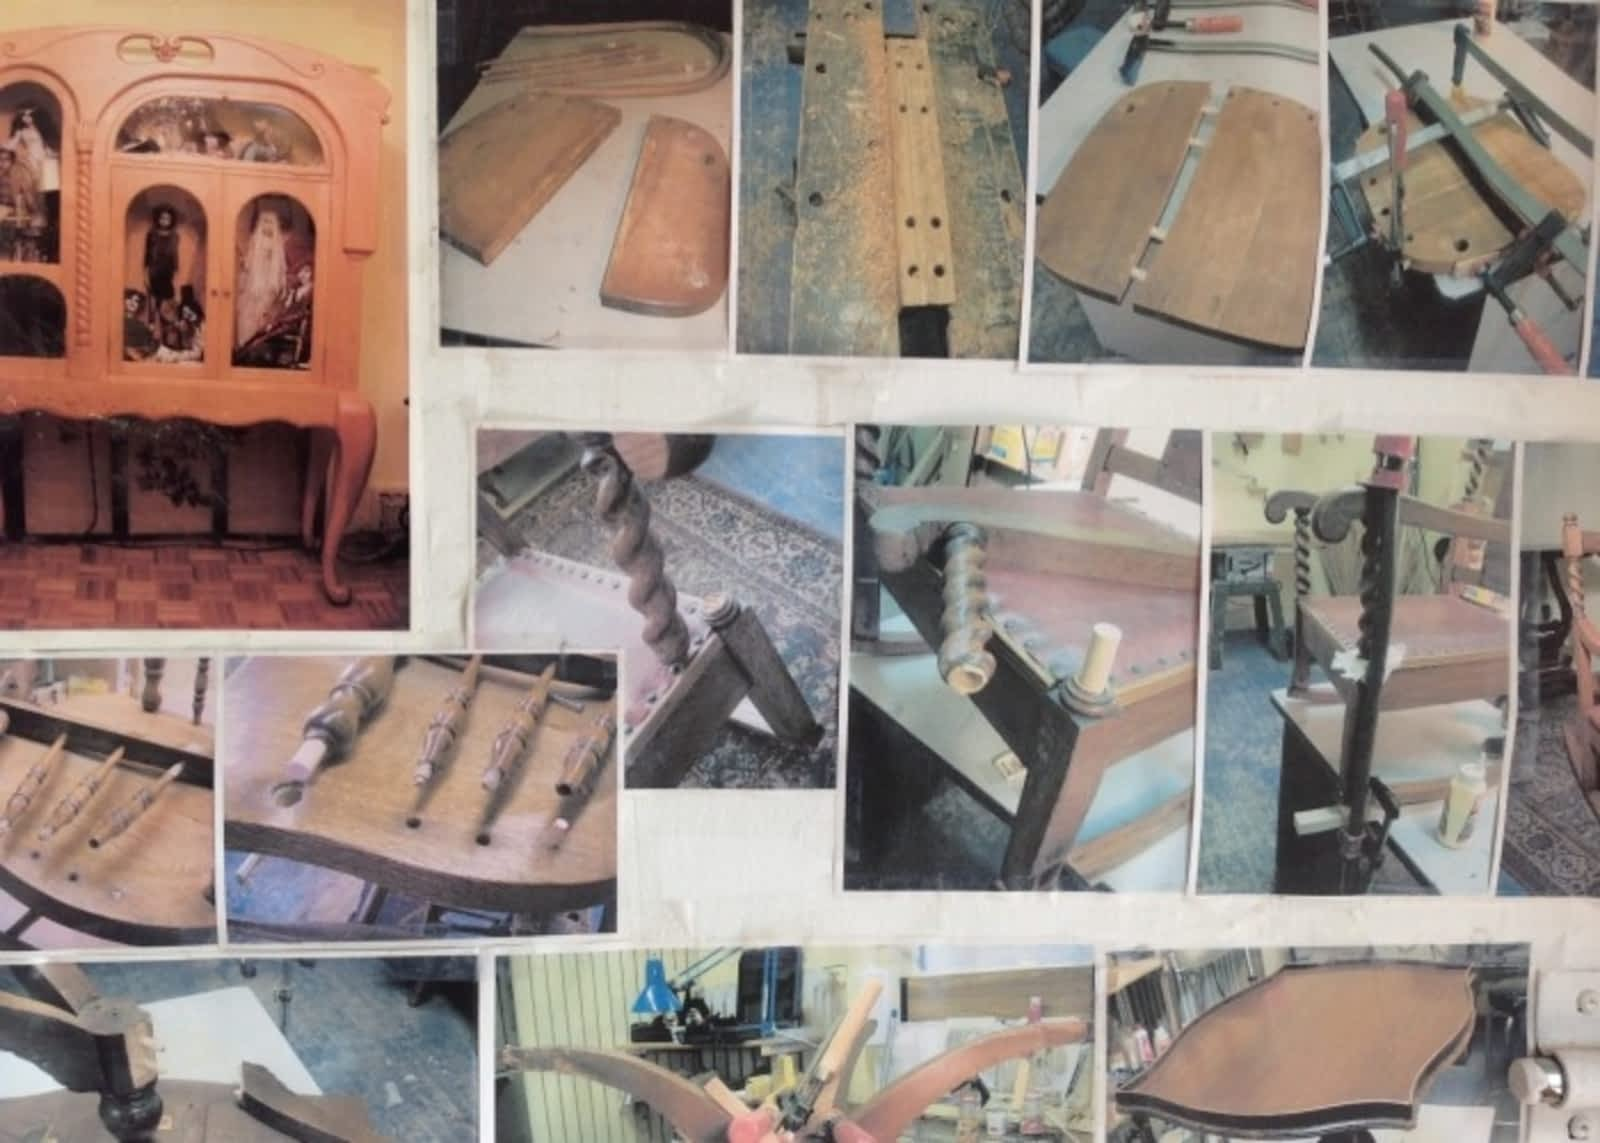 Pleasing Broken Leg Furniture Repair Opening Hours B 1600 Gerrard Interior Design Ideas Clesiryabchikinfo